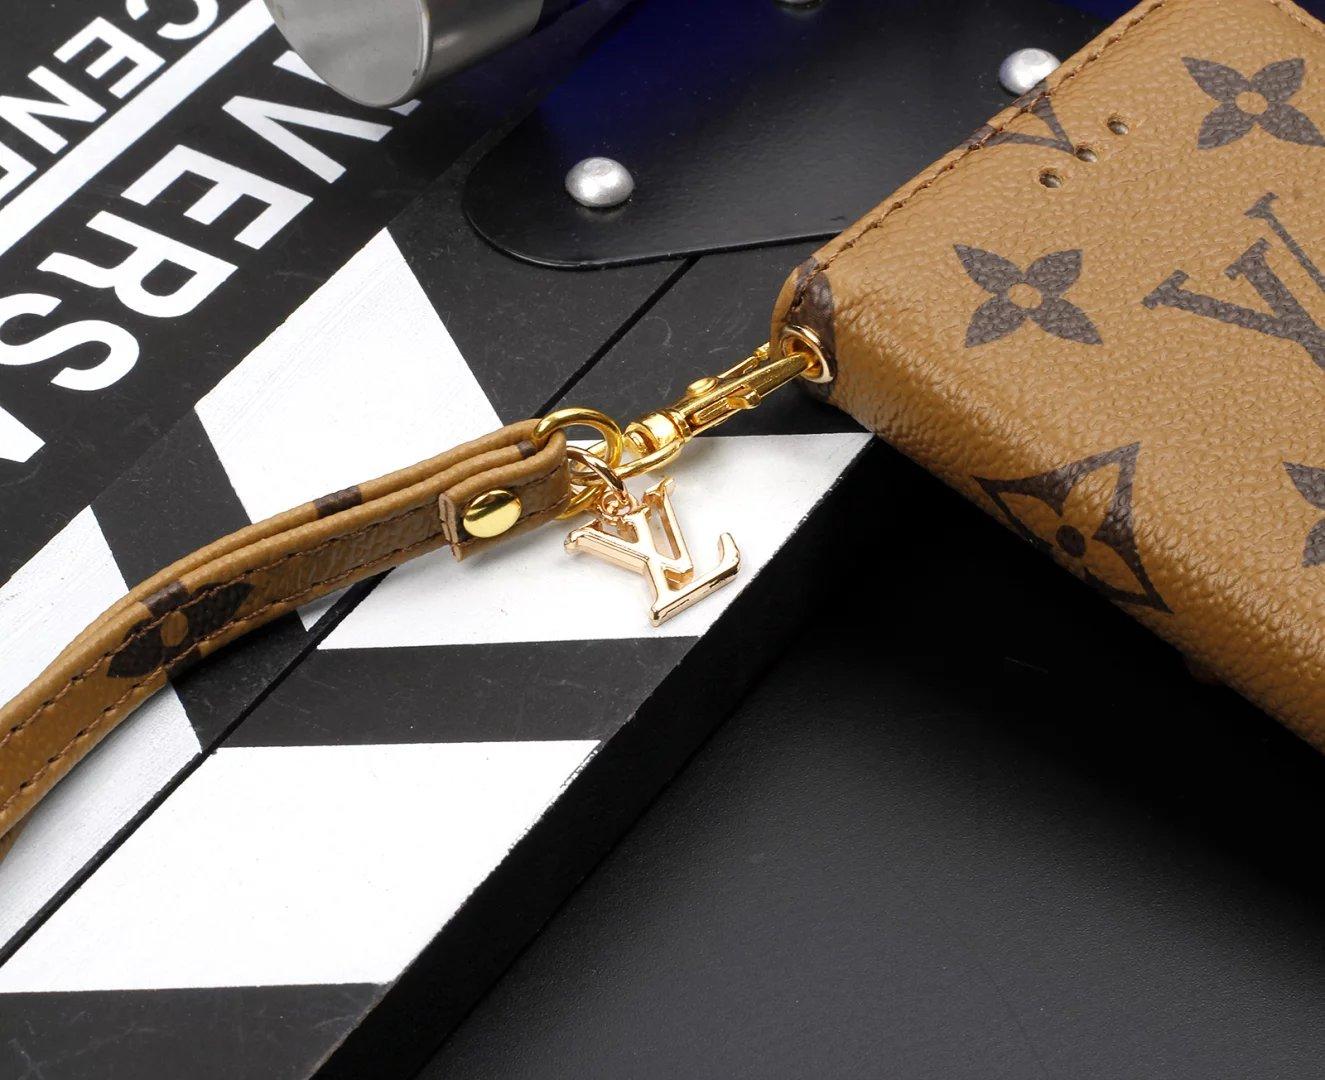 iphone schutzhülle iphone handyhülle Louis Vuitton iphone6 hülle handykappen mit foto silikon handyhüllen zubehör iphone 6 handytasche iphone 6 leder iphone hülle mit foto bedrucken apple zubehör iphone 6